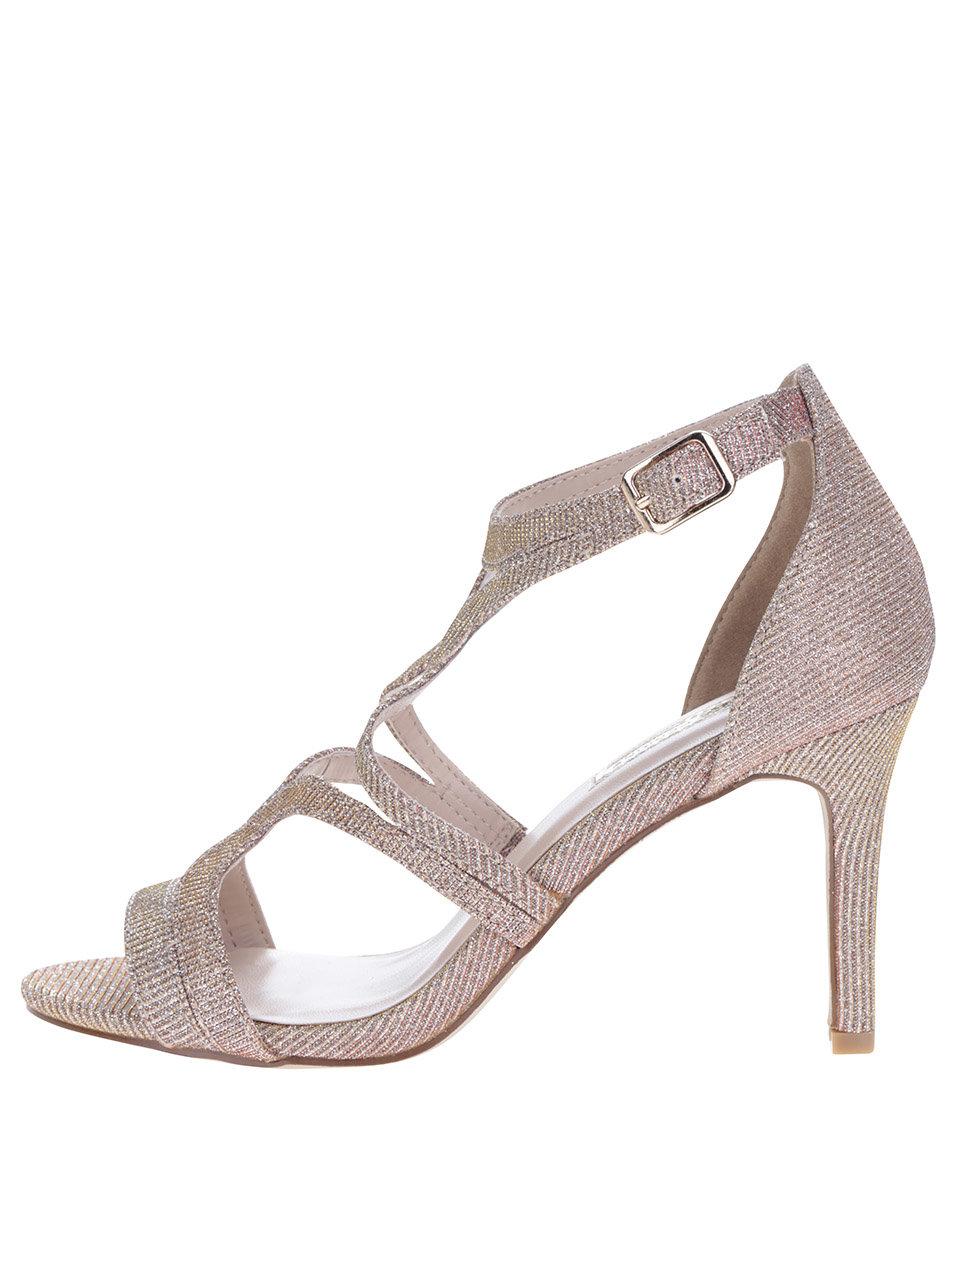 42354611ae49 Metalické sandálky na podpatku ve růžovozlaté barvě Dorothy Perkins ...